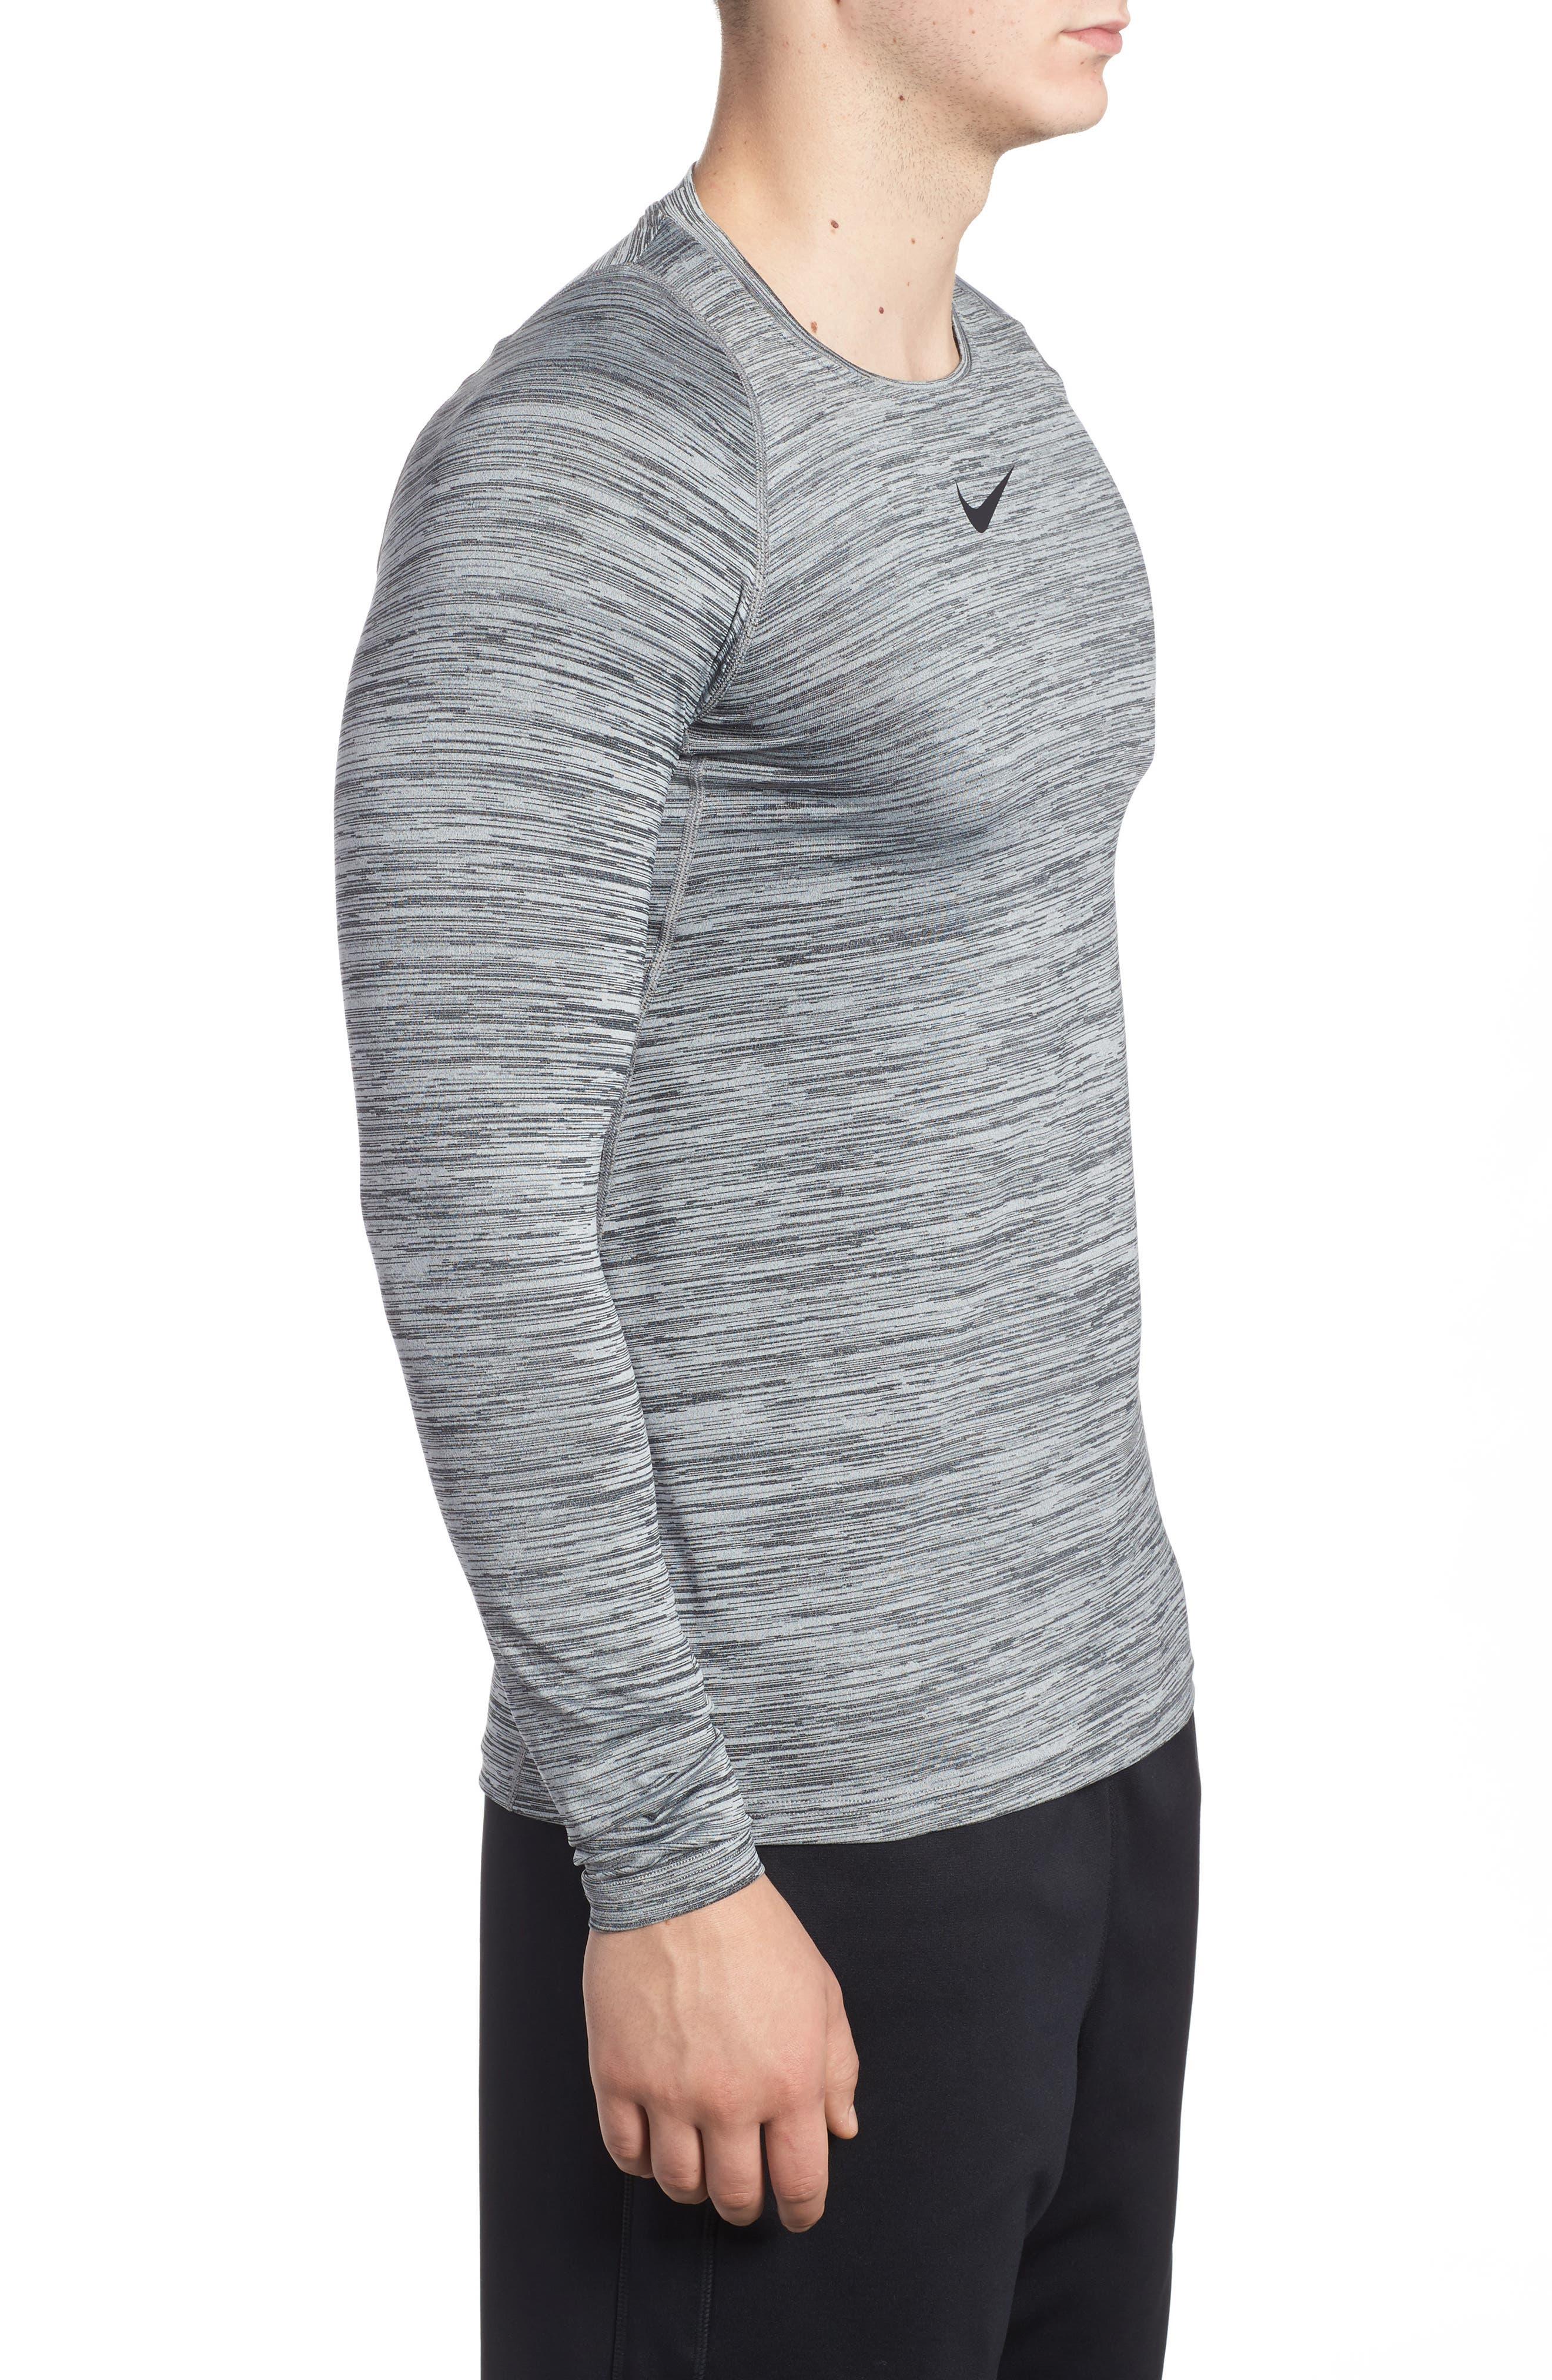 Pro Long Sleeve T-Shirt,                             Alternate thumbnail 3, color,                             010